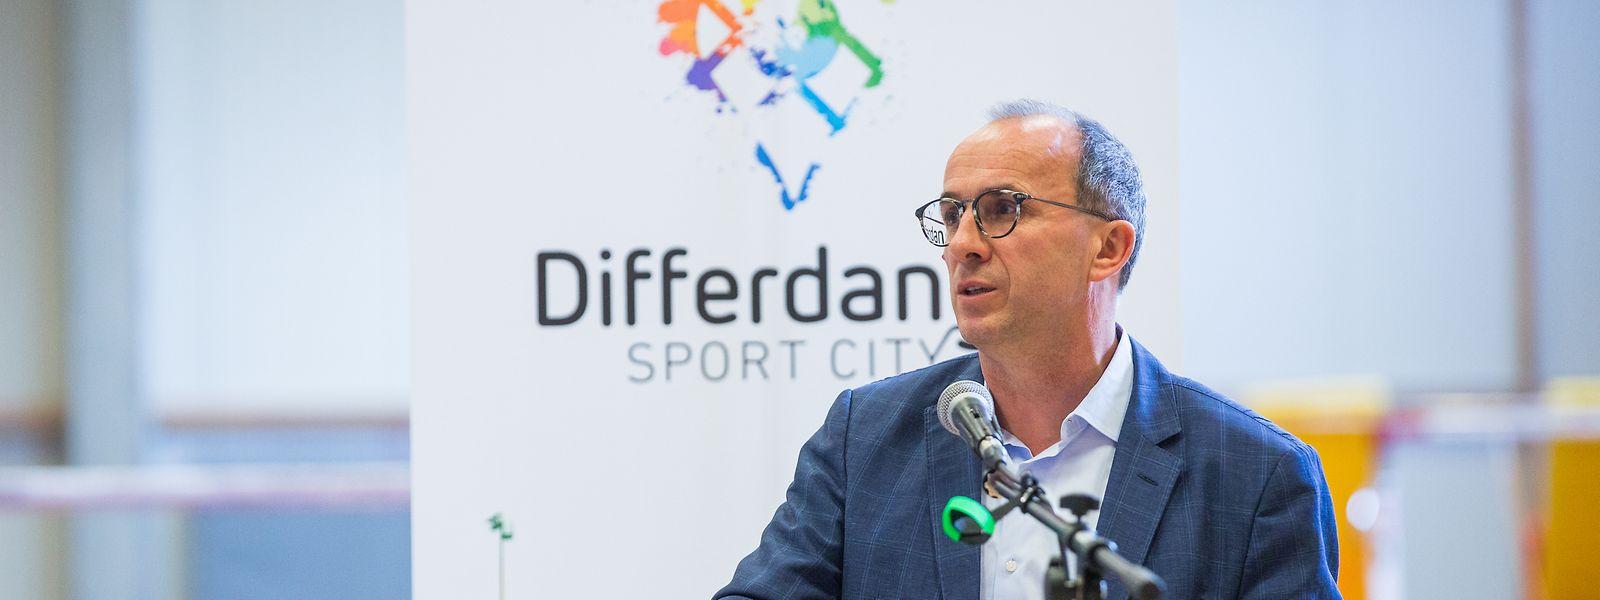 Roberto Traversini könnte am Freitag seinen Rücktritt erklären.